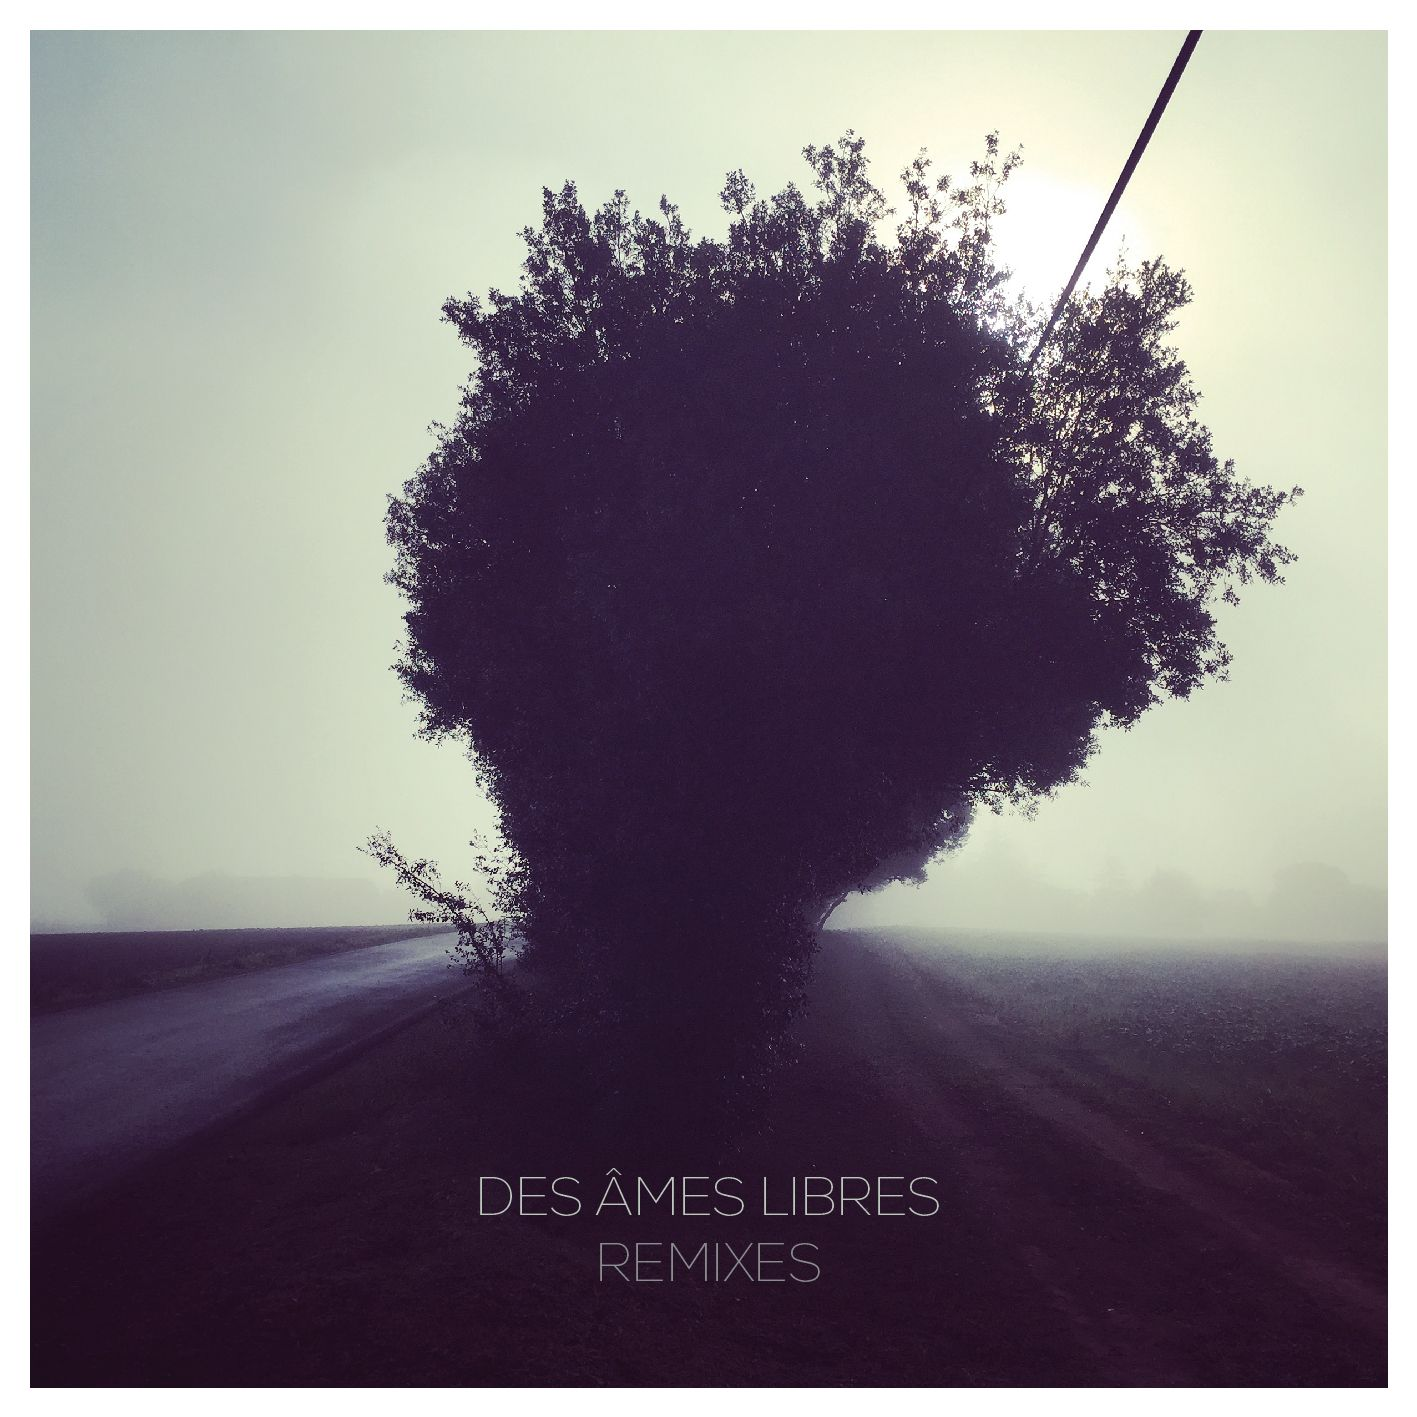 cd_dal_remixes_1.jpg